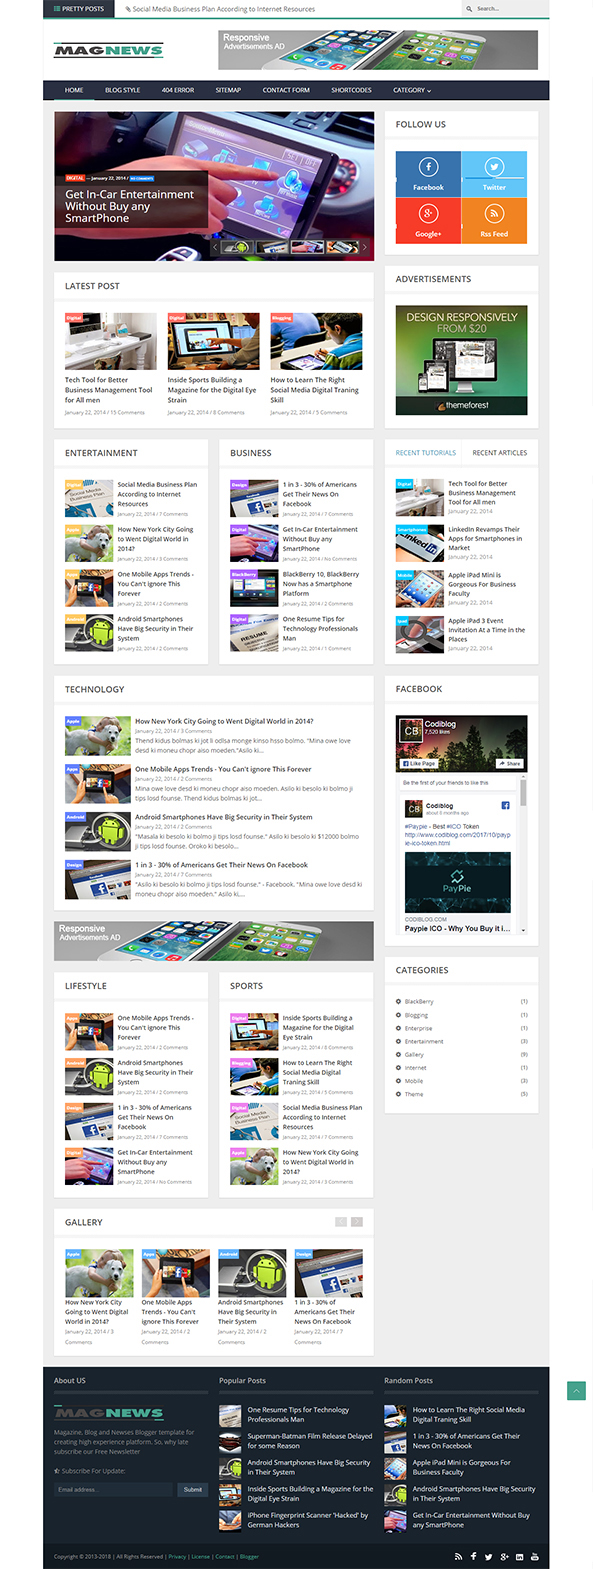 Cleanblog - A Responsive Blogging Blogger Template